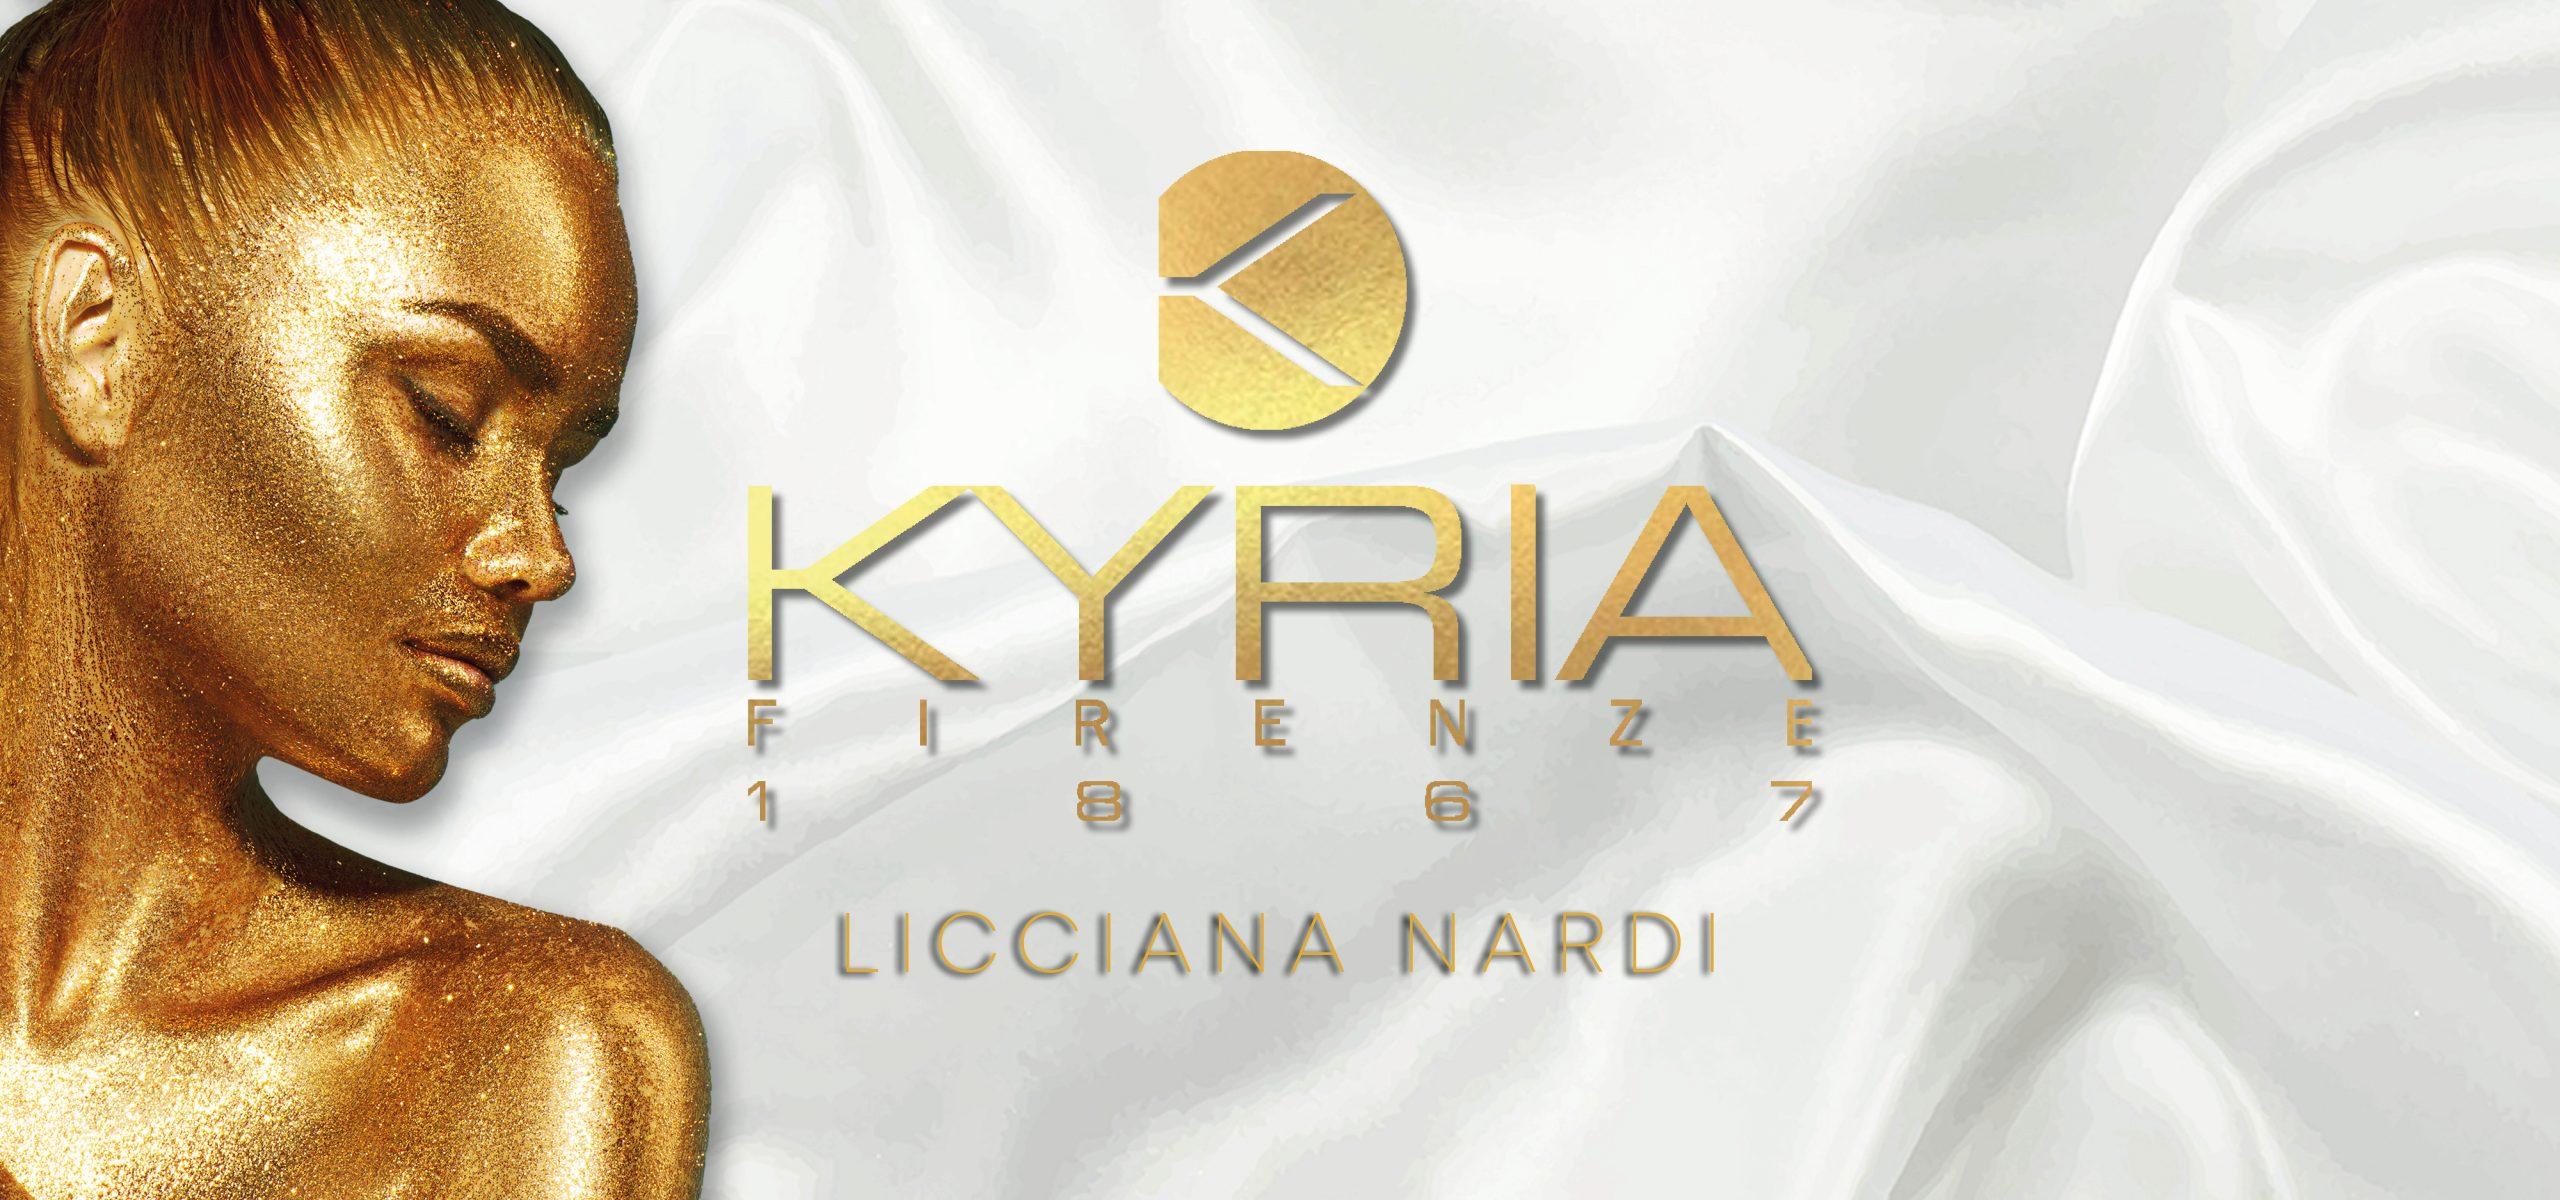 Estetista Licciana Nardi